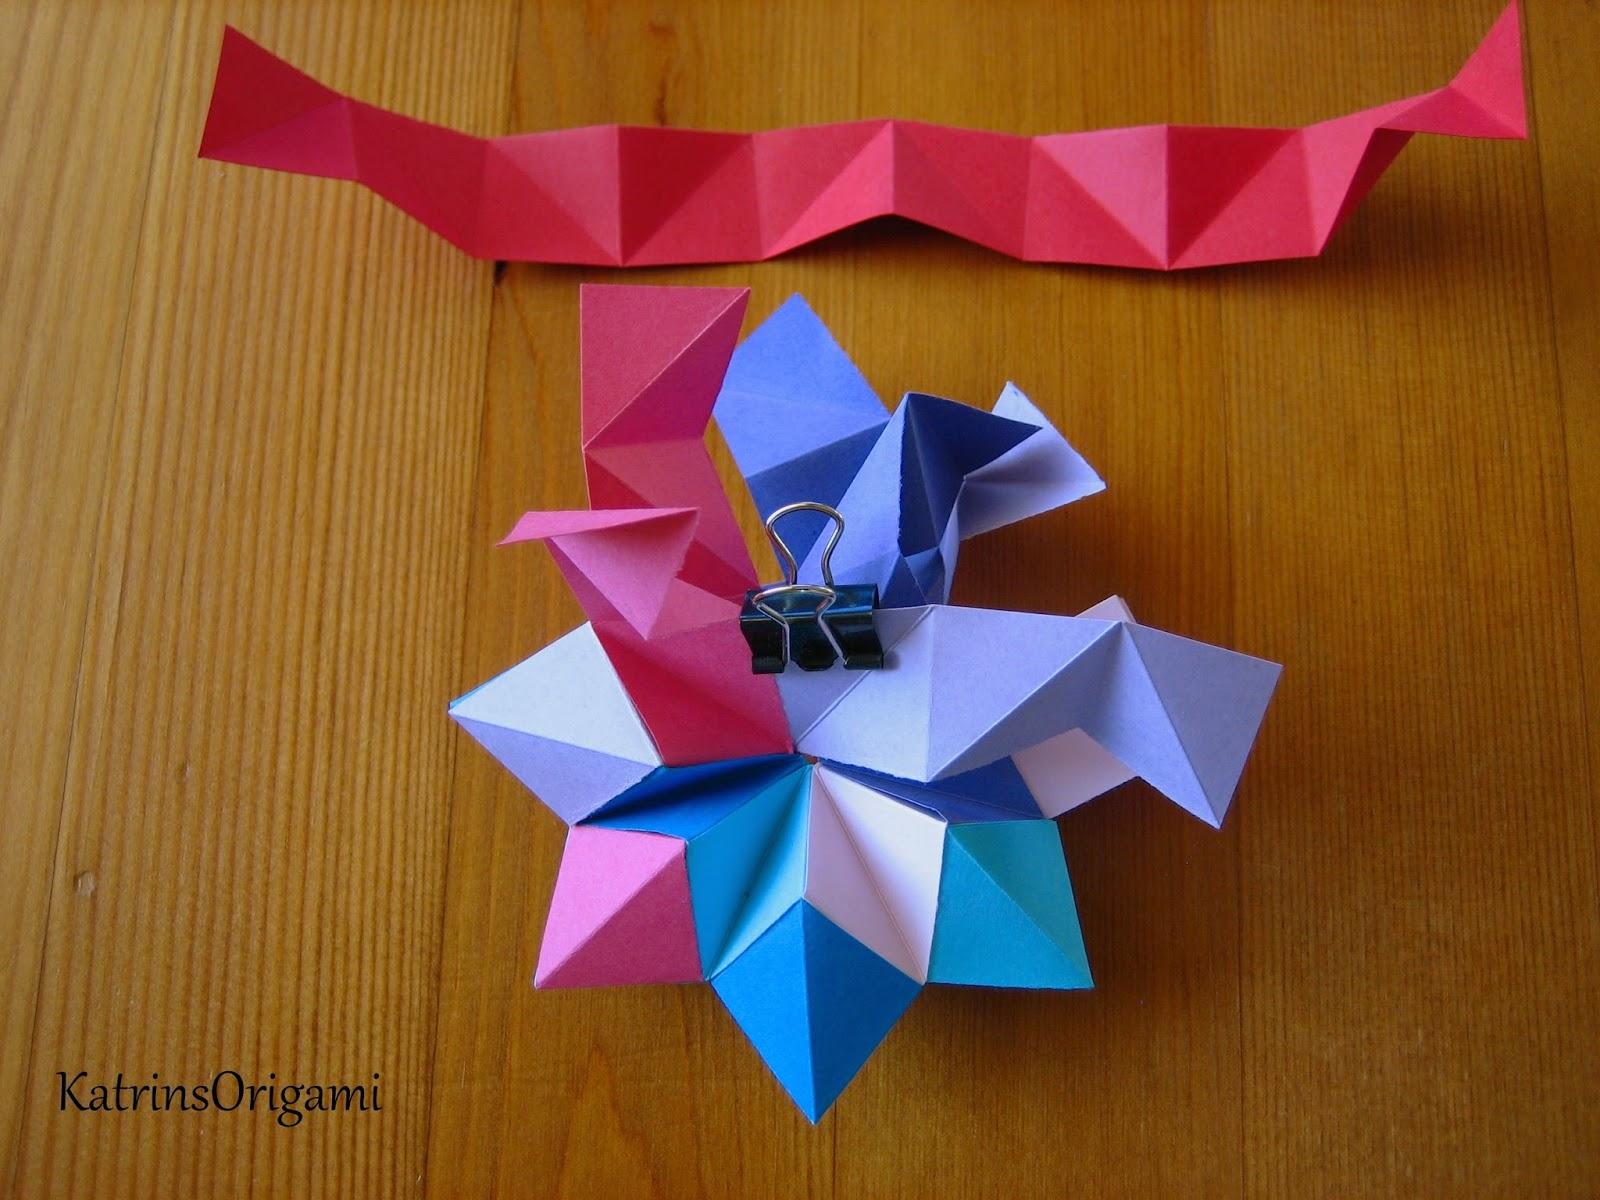 origami die kunst des papierfaltens margarete stern. Black Bedroom Furniture Sets. Home Design Ideas